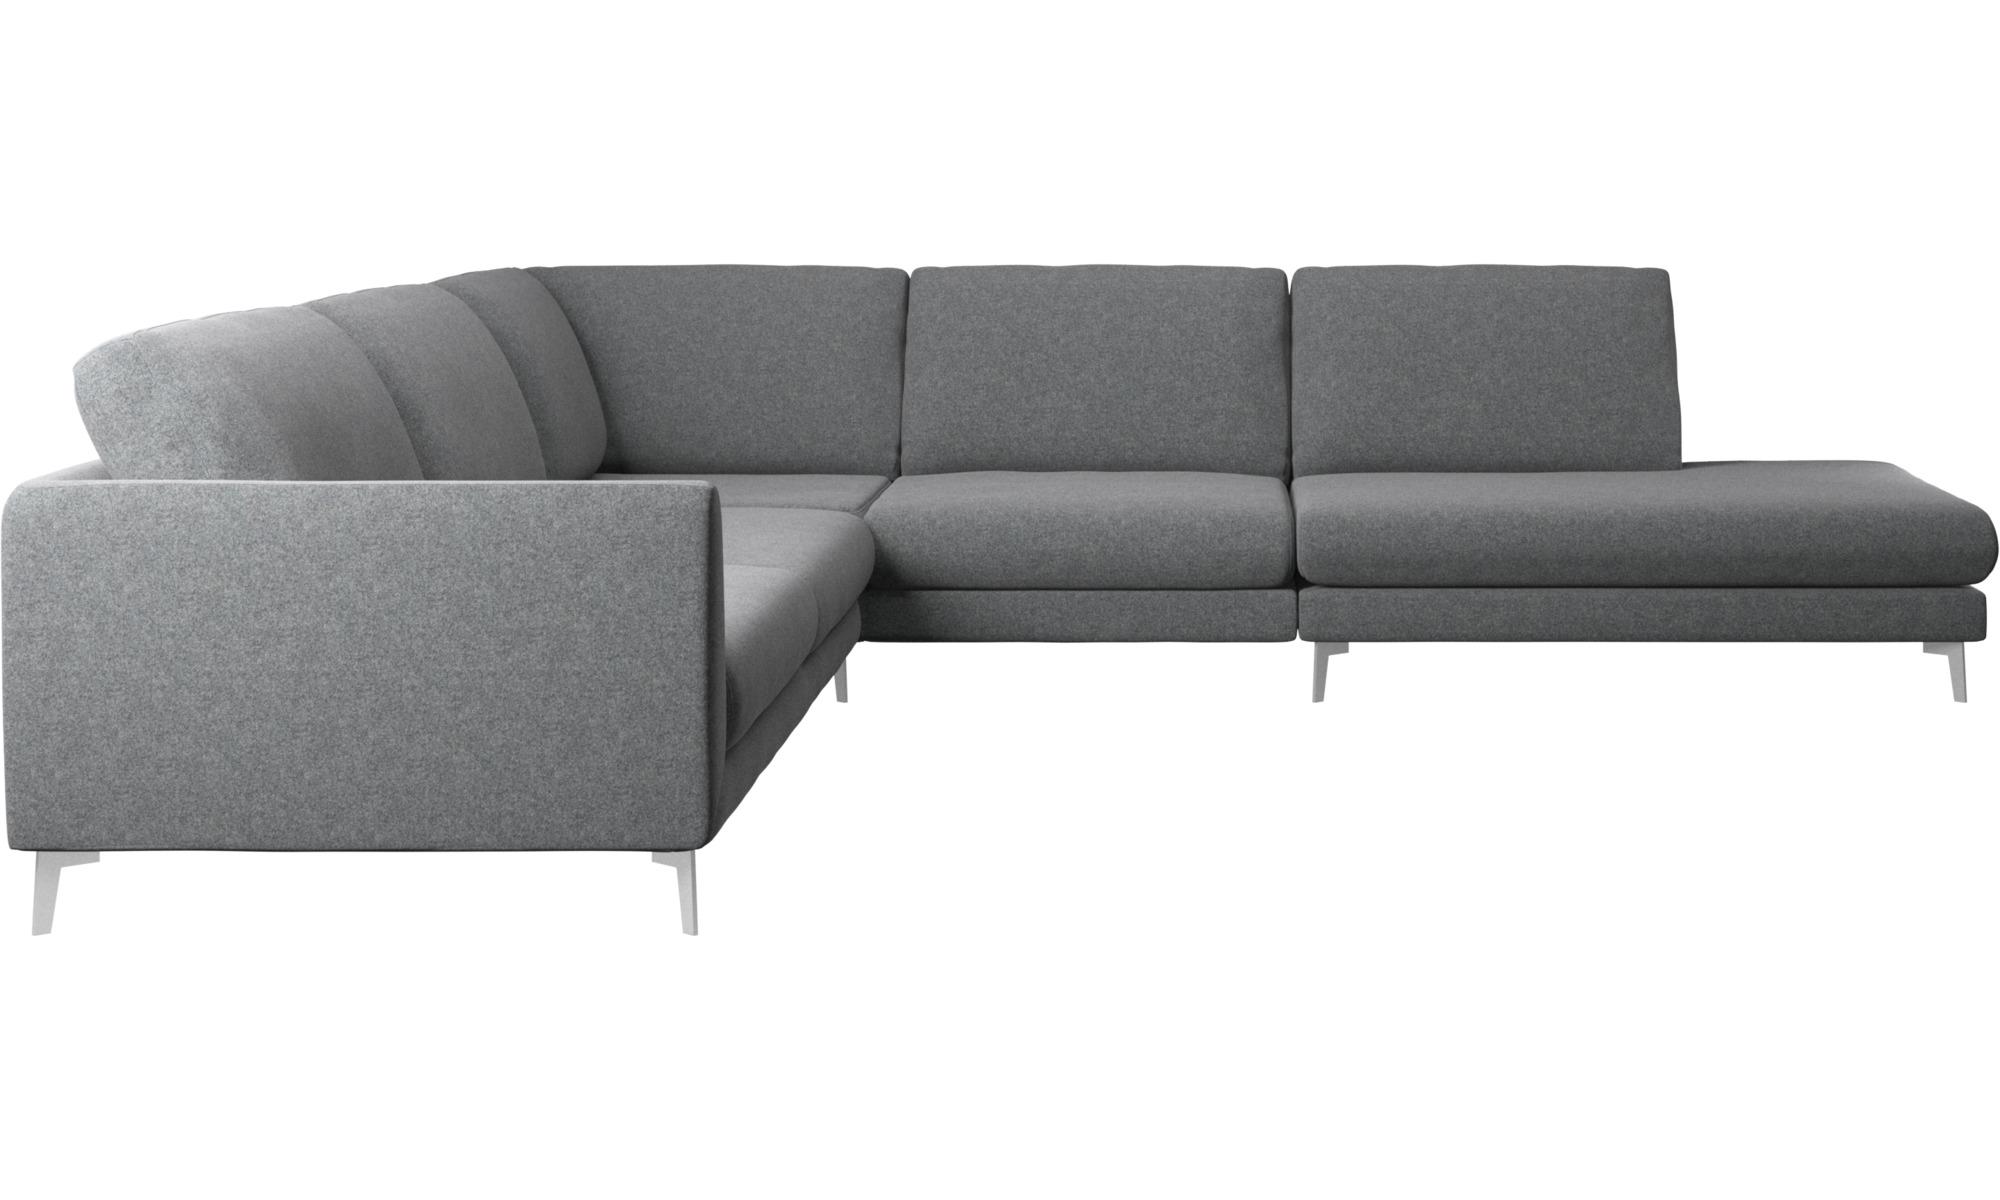 Hjørnesofaer - Fargo hjørnesofa med loungemodul - Grå - Stof